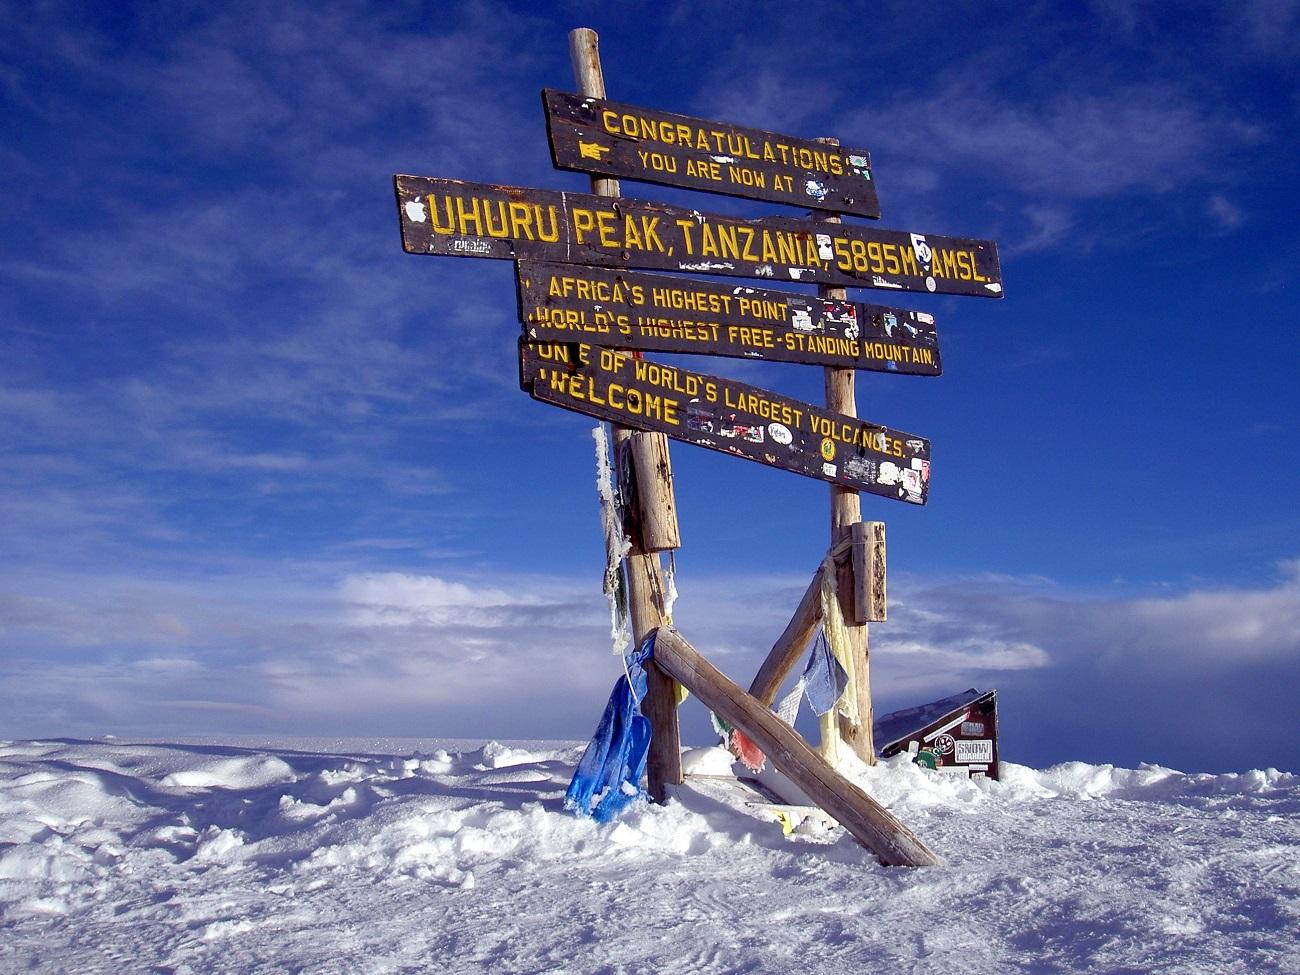 Uhuru Peak, cel mai înalt vârf al Muntelui Kilimanjaro